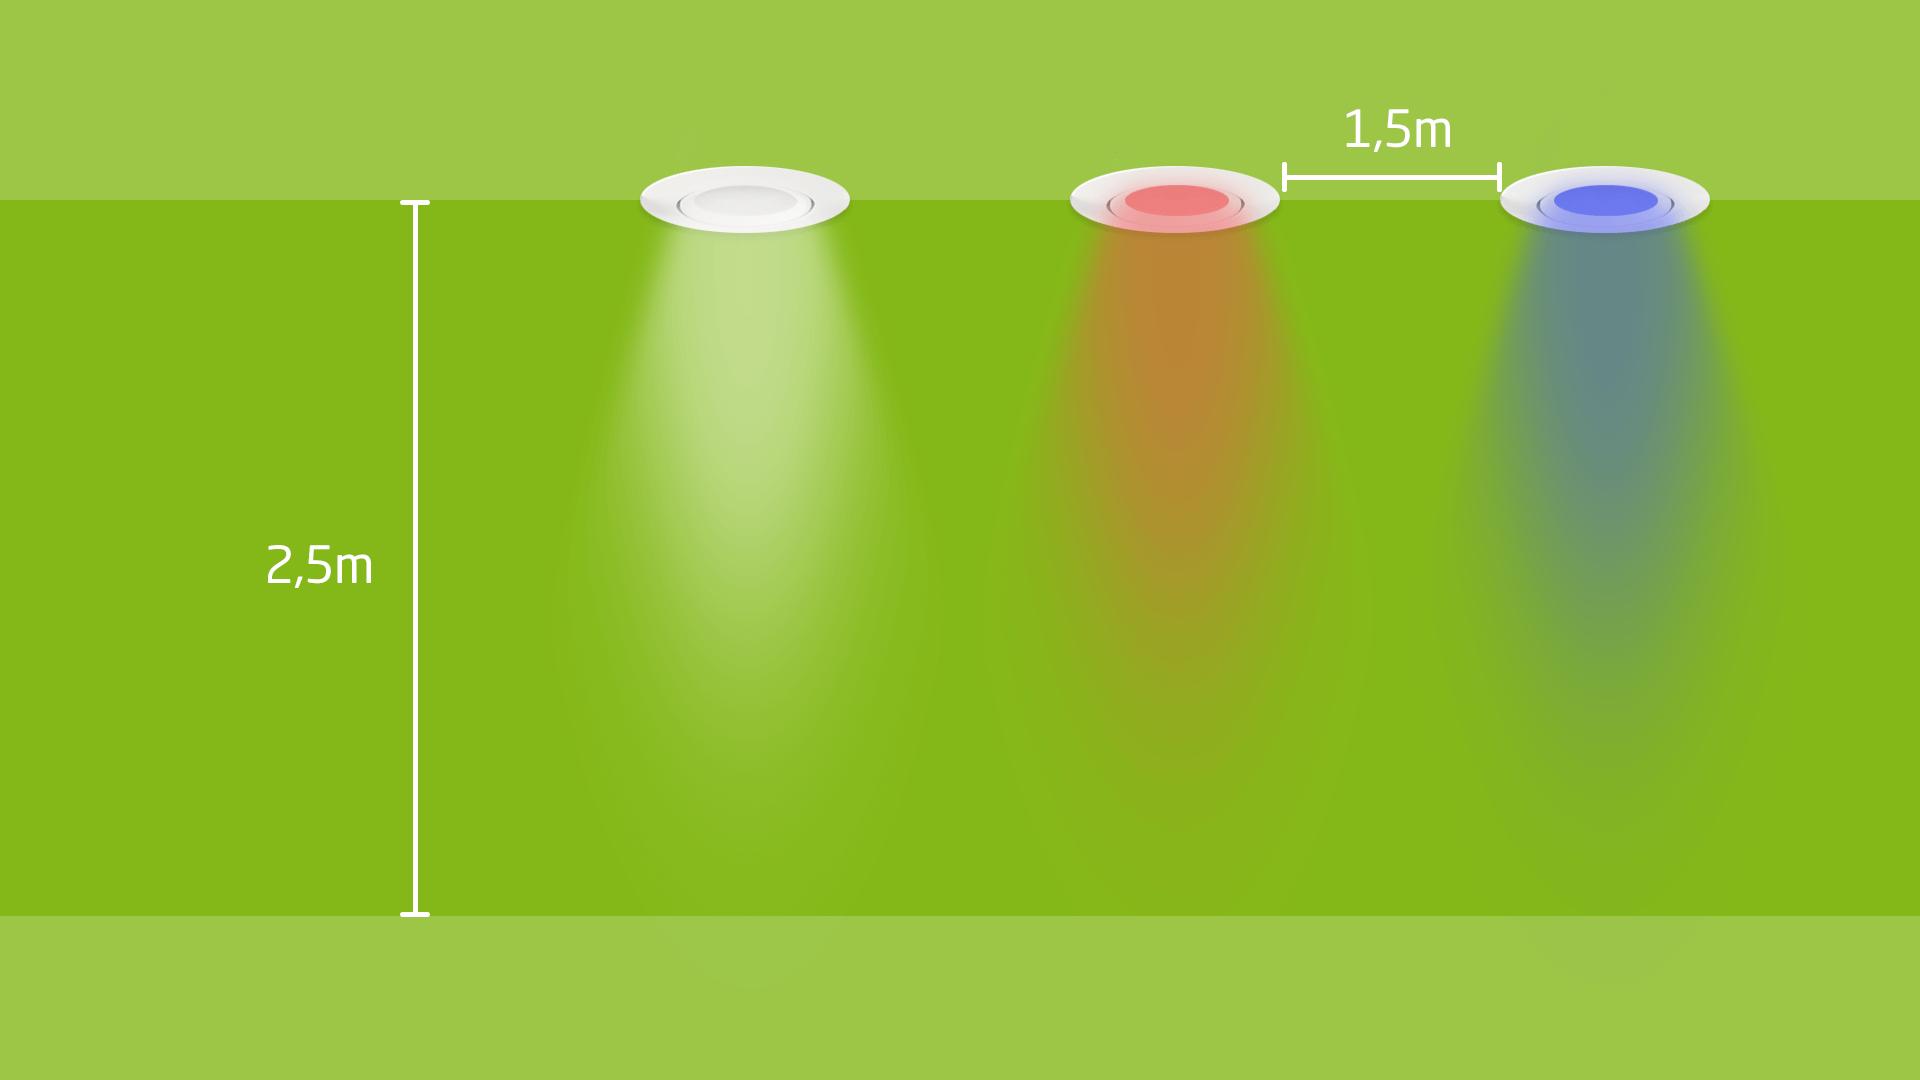 Positionierung RGBW LED Spots